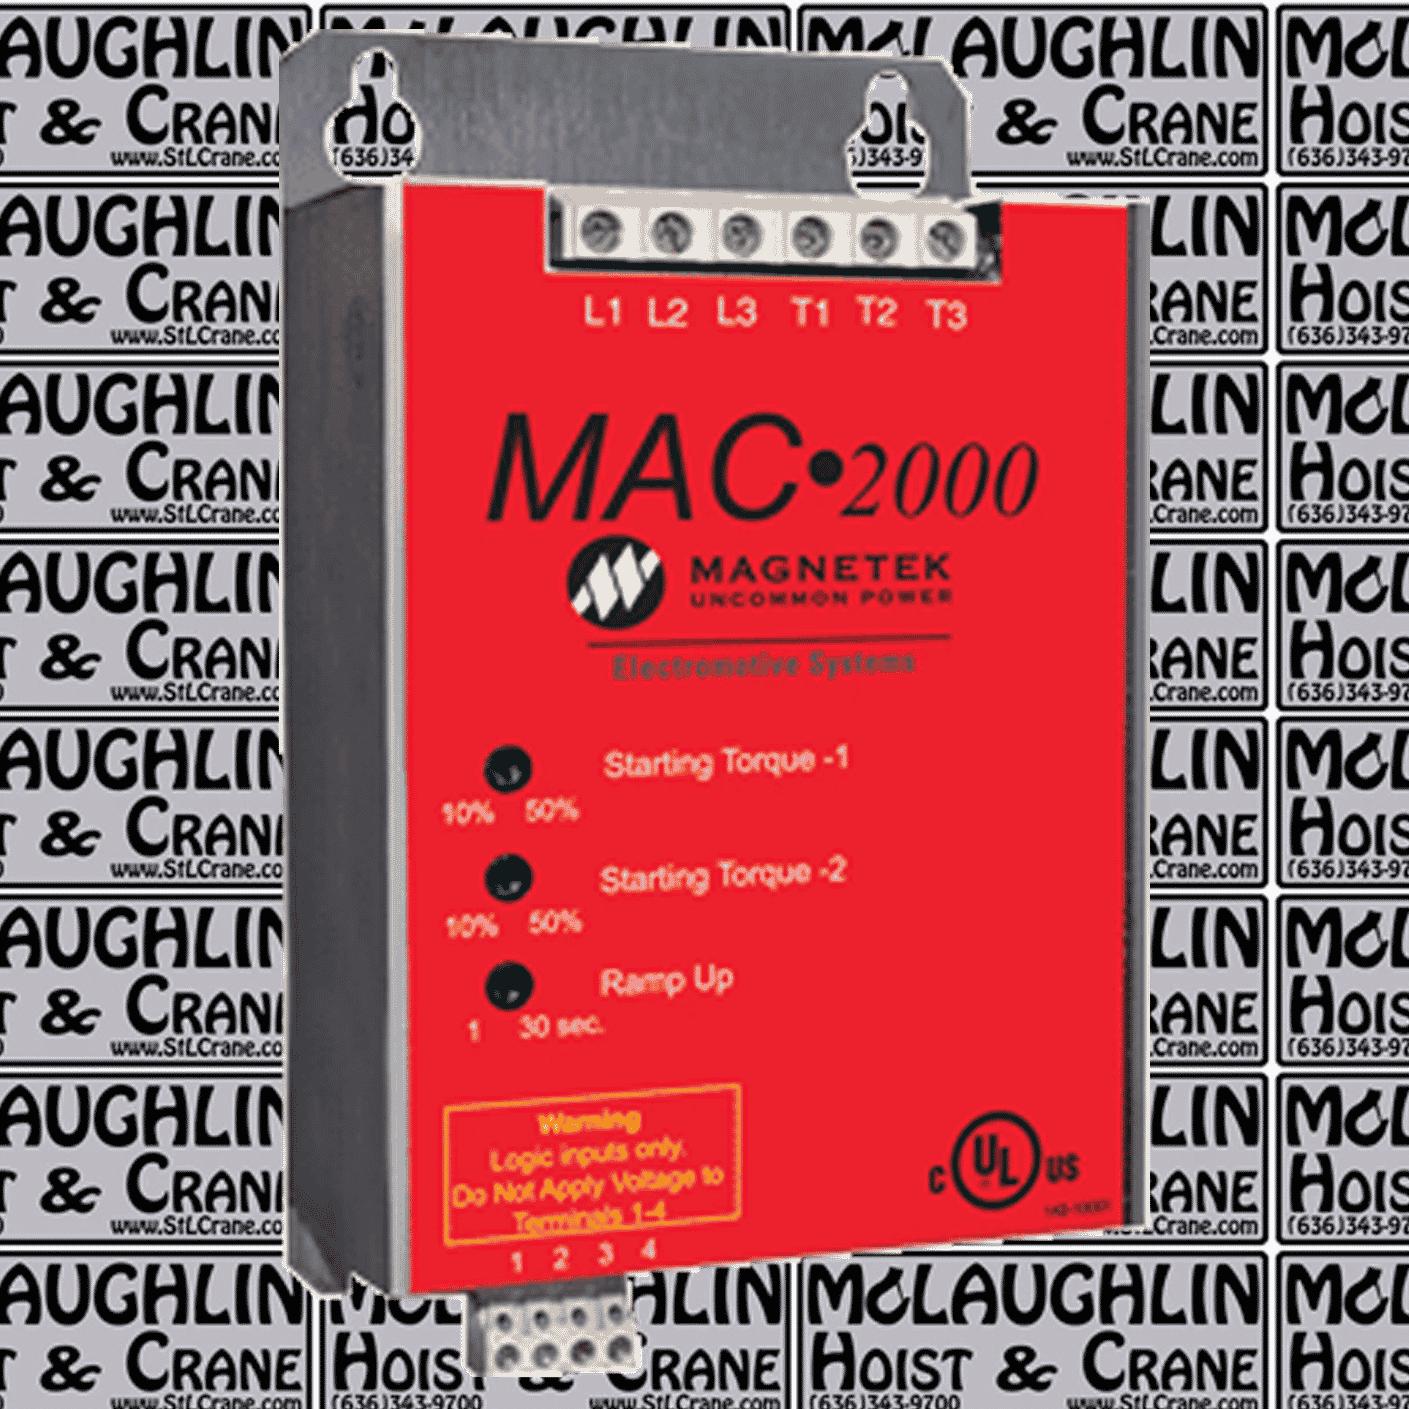 Magnetek MAC 2000 Soft Start